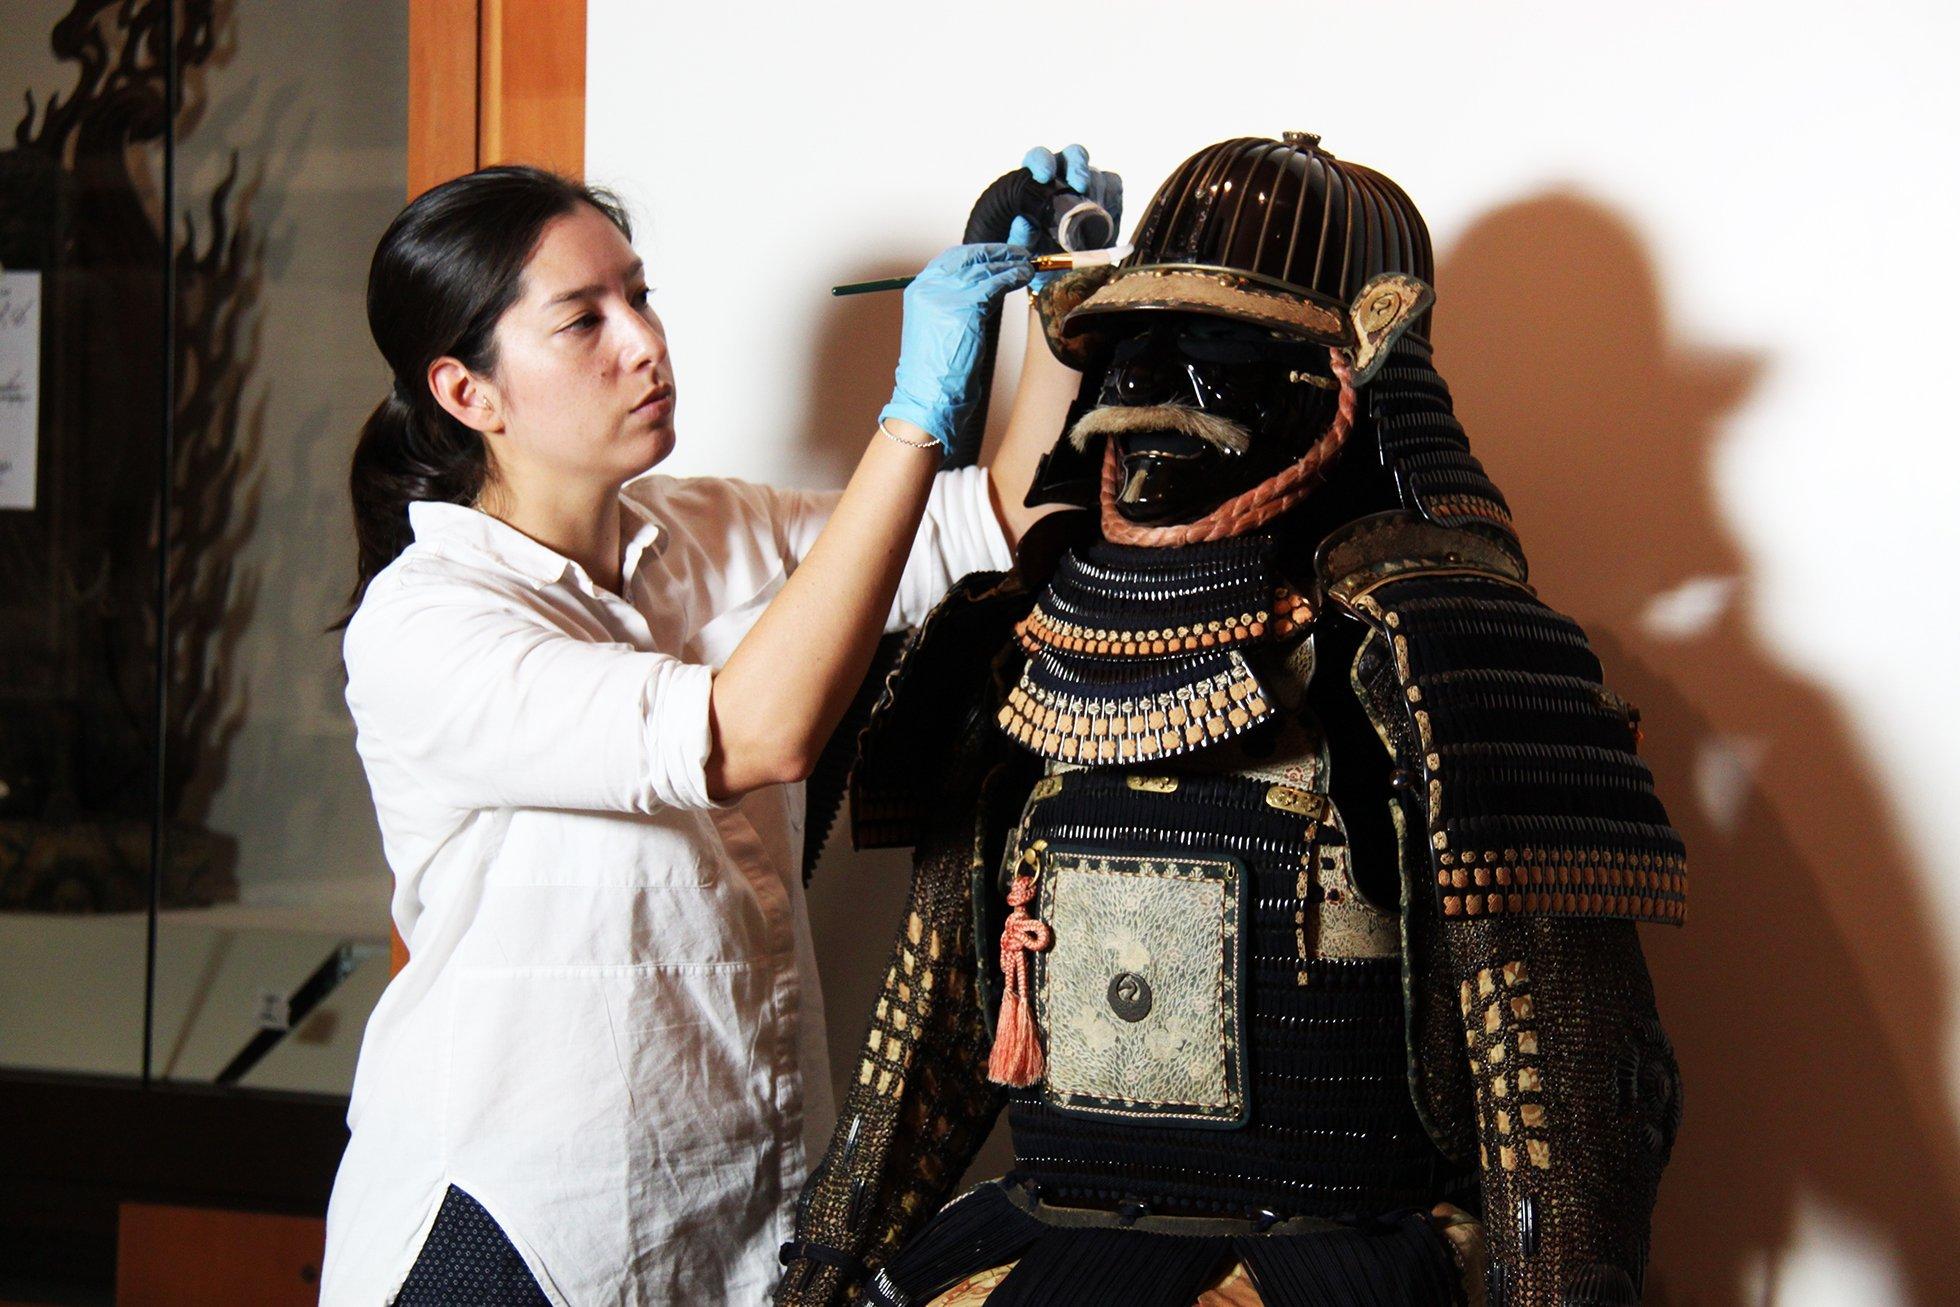 Como eram feitas as antigas armaduras samurais?